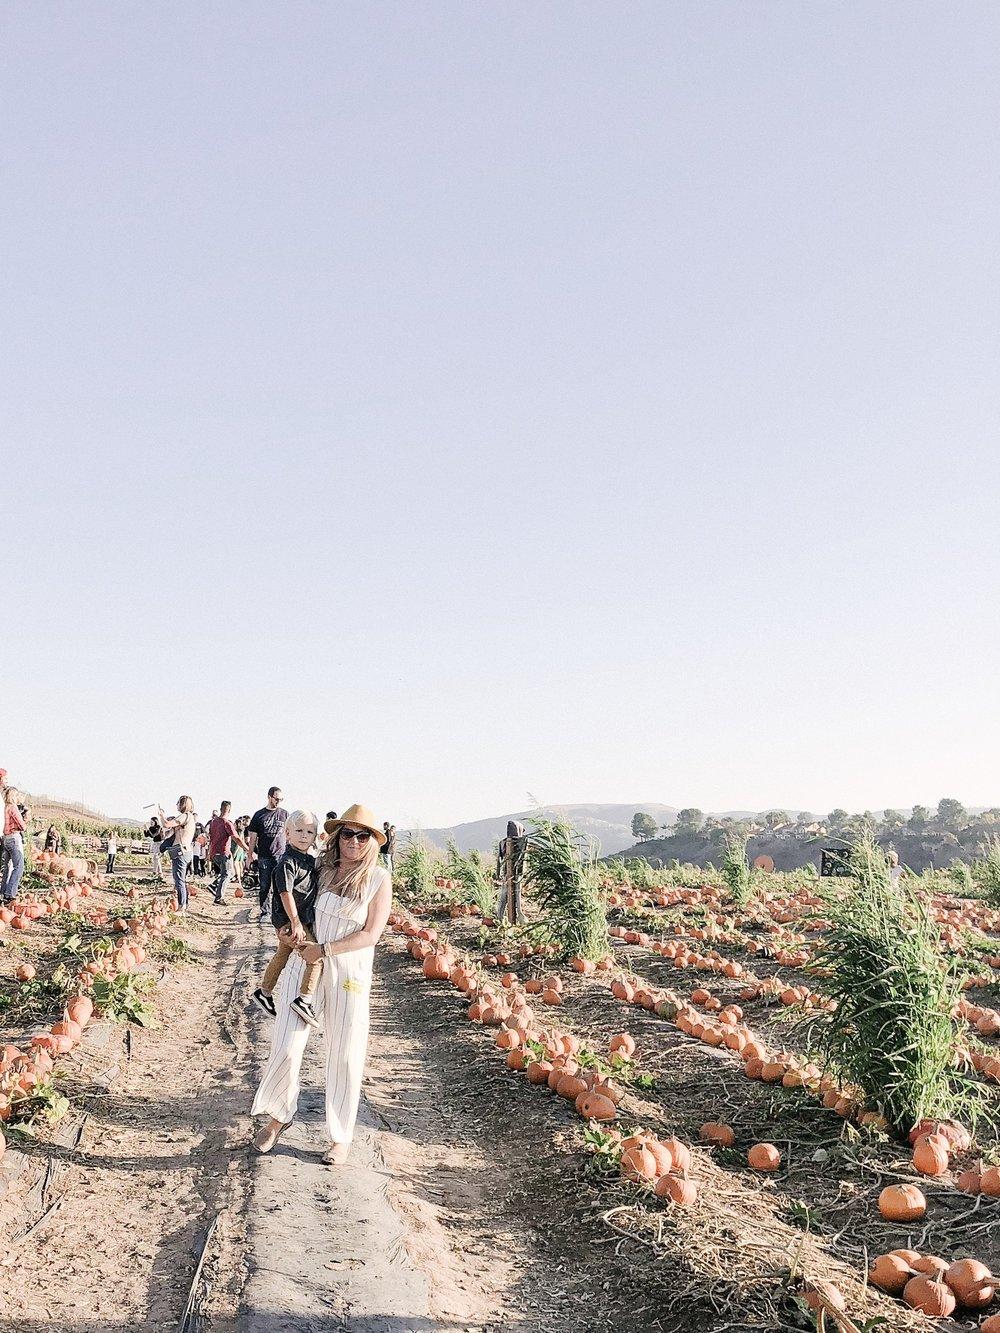 tanaka farms pumpkin patchJPG